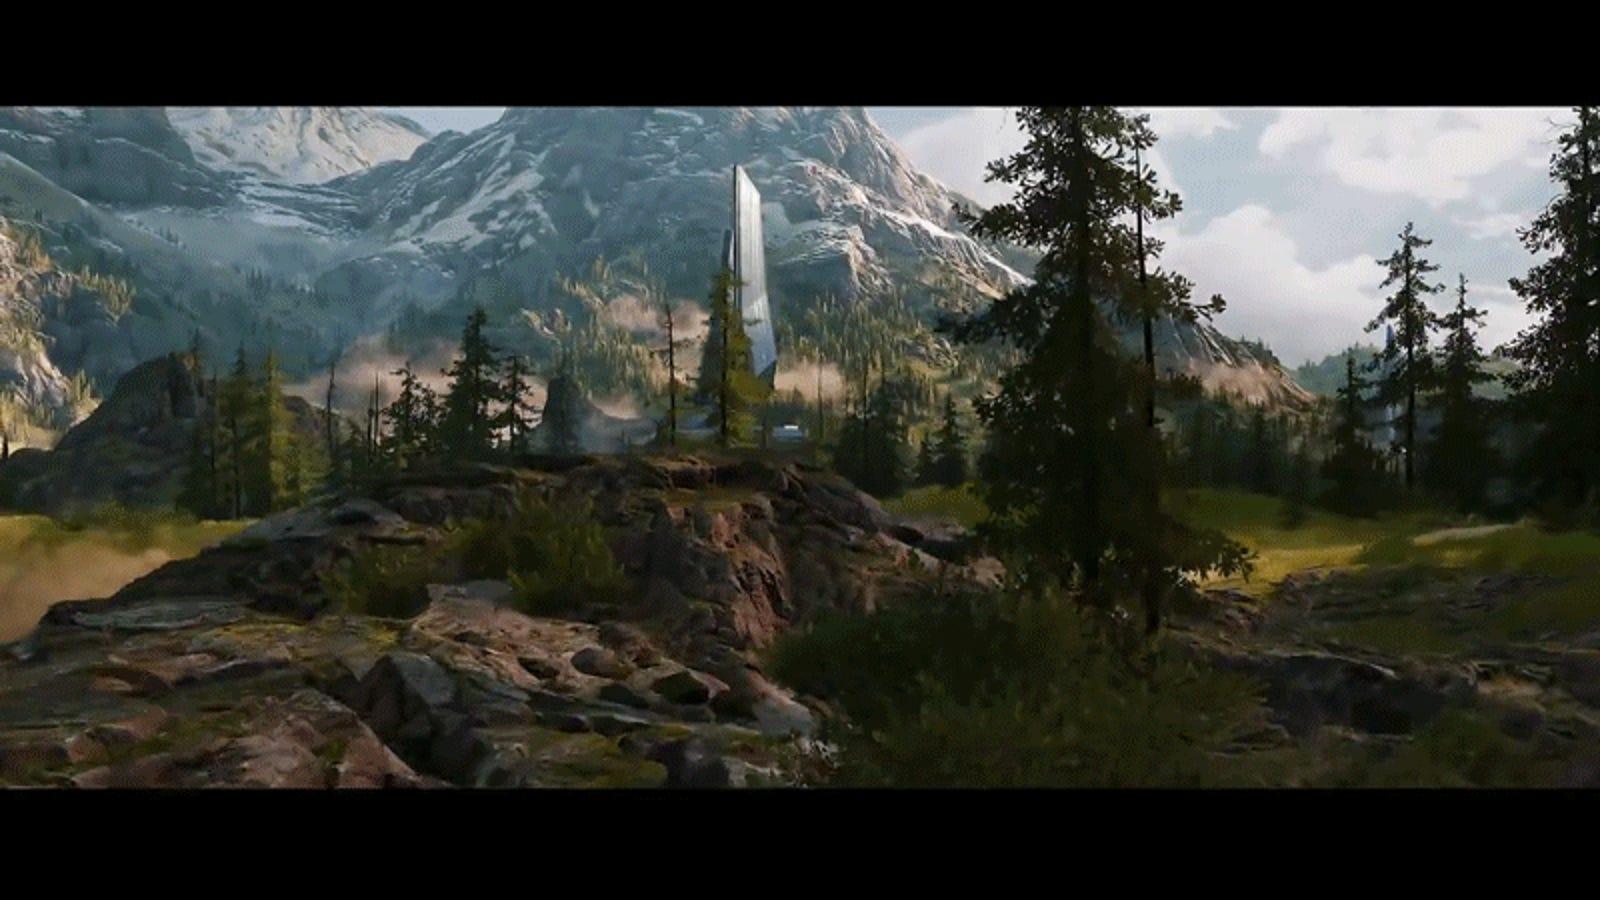 Dammit The Halo 6: Infinite Trailer Has The Hateful Warthog